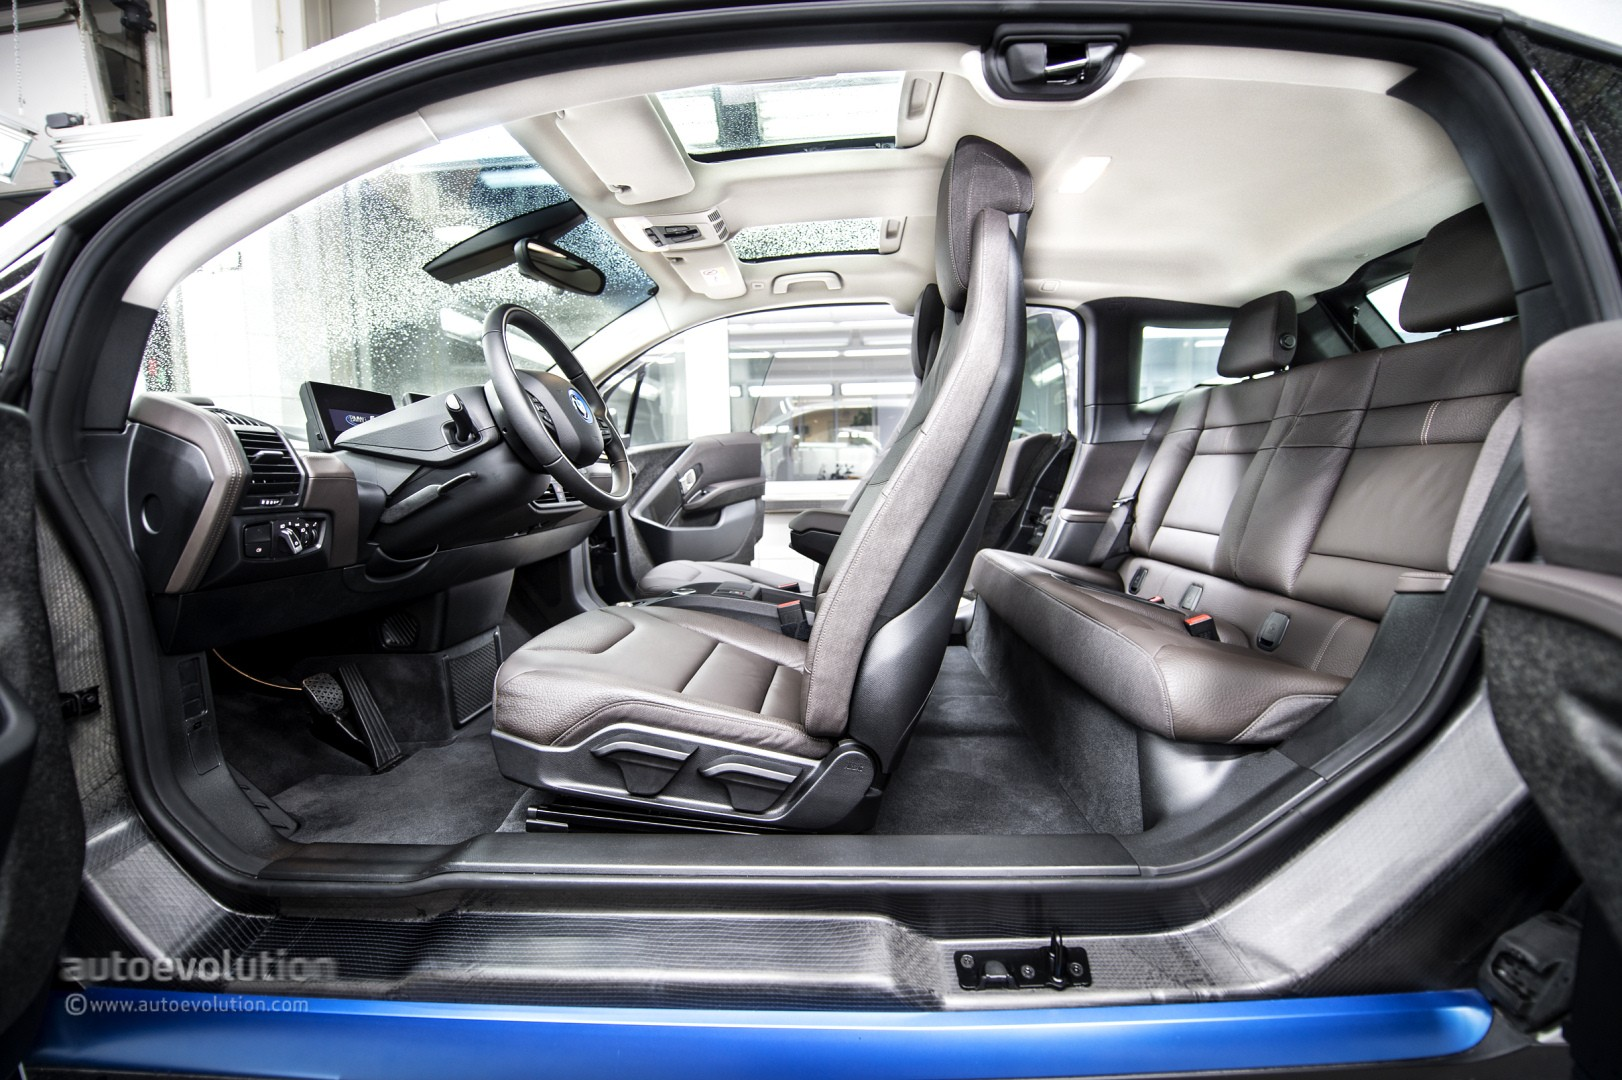 BMW i3 Wins Green Car of the Year Award 2015  autoevolution